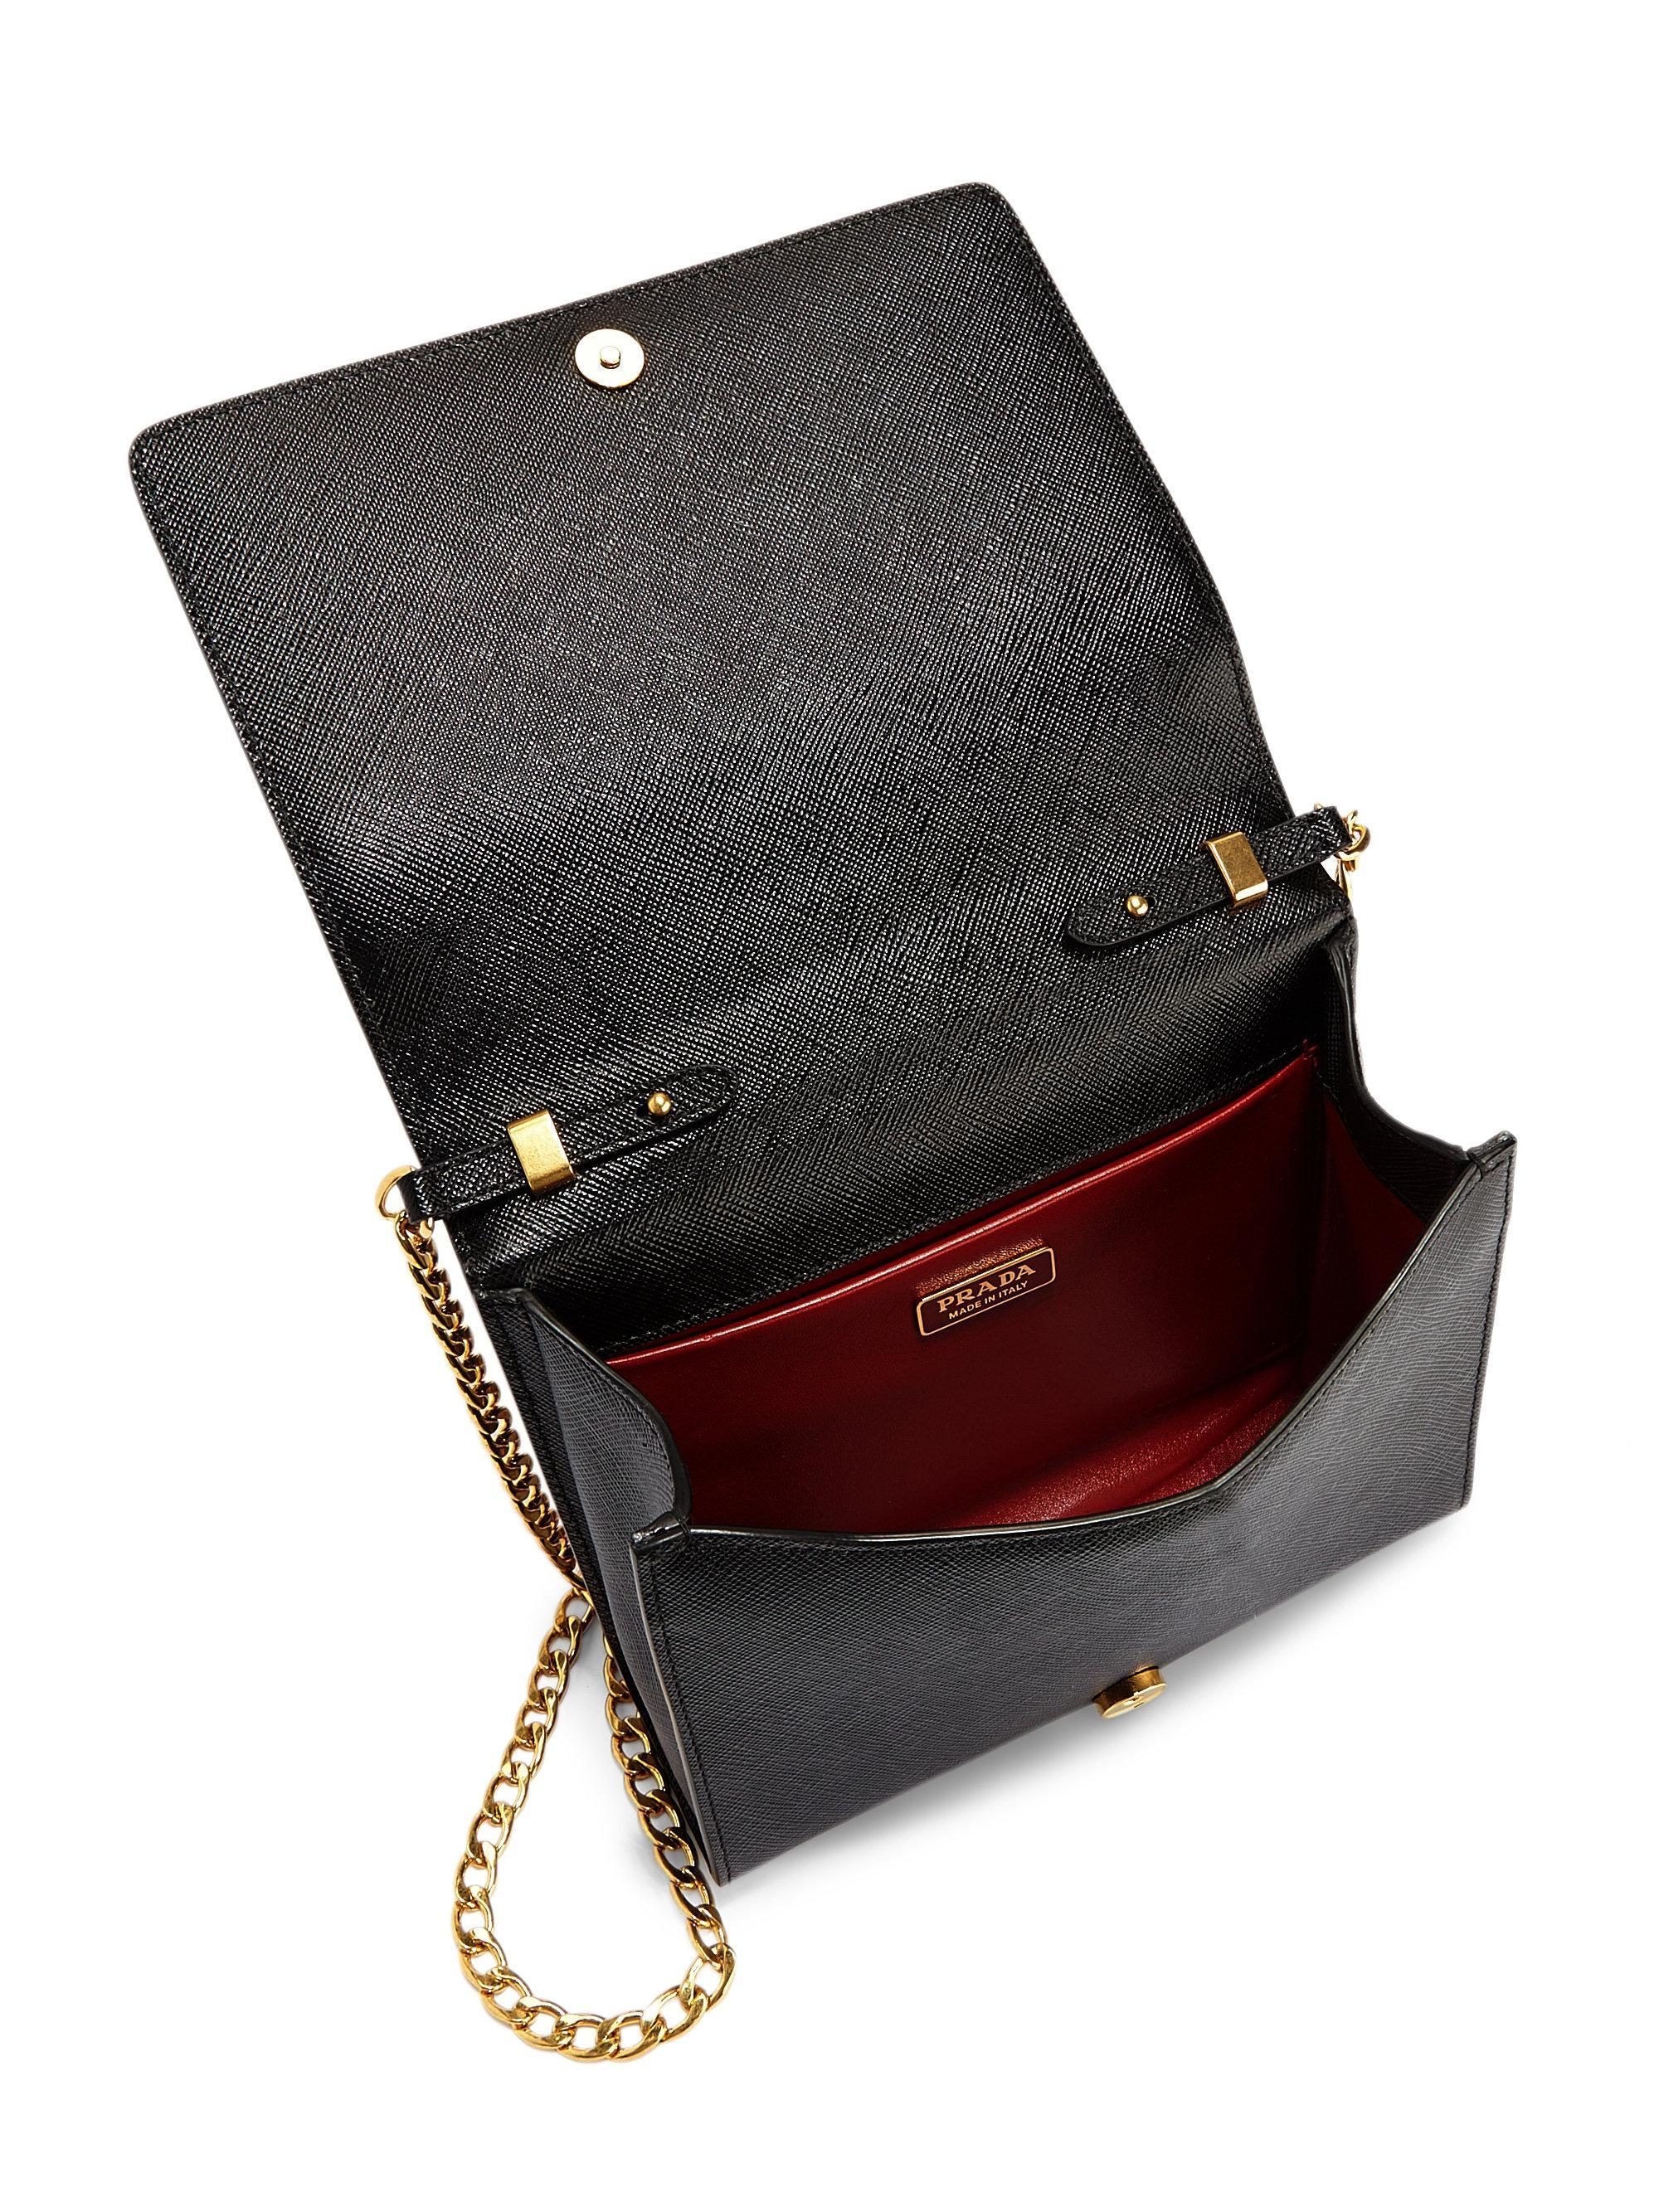 76dcb853905 Prada Saffiano Lux Chain Wallet in Black - Lyst